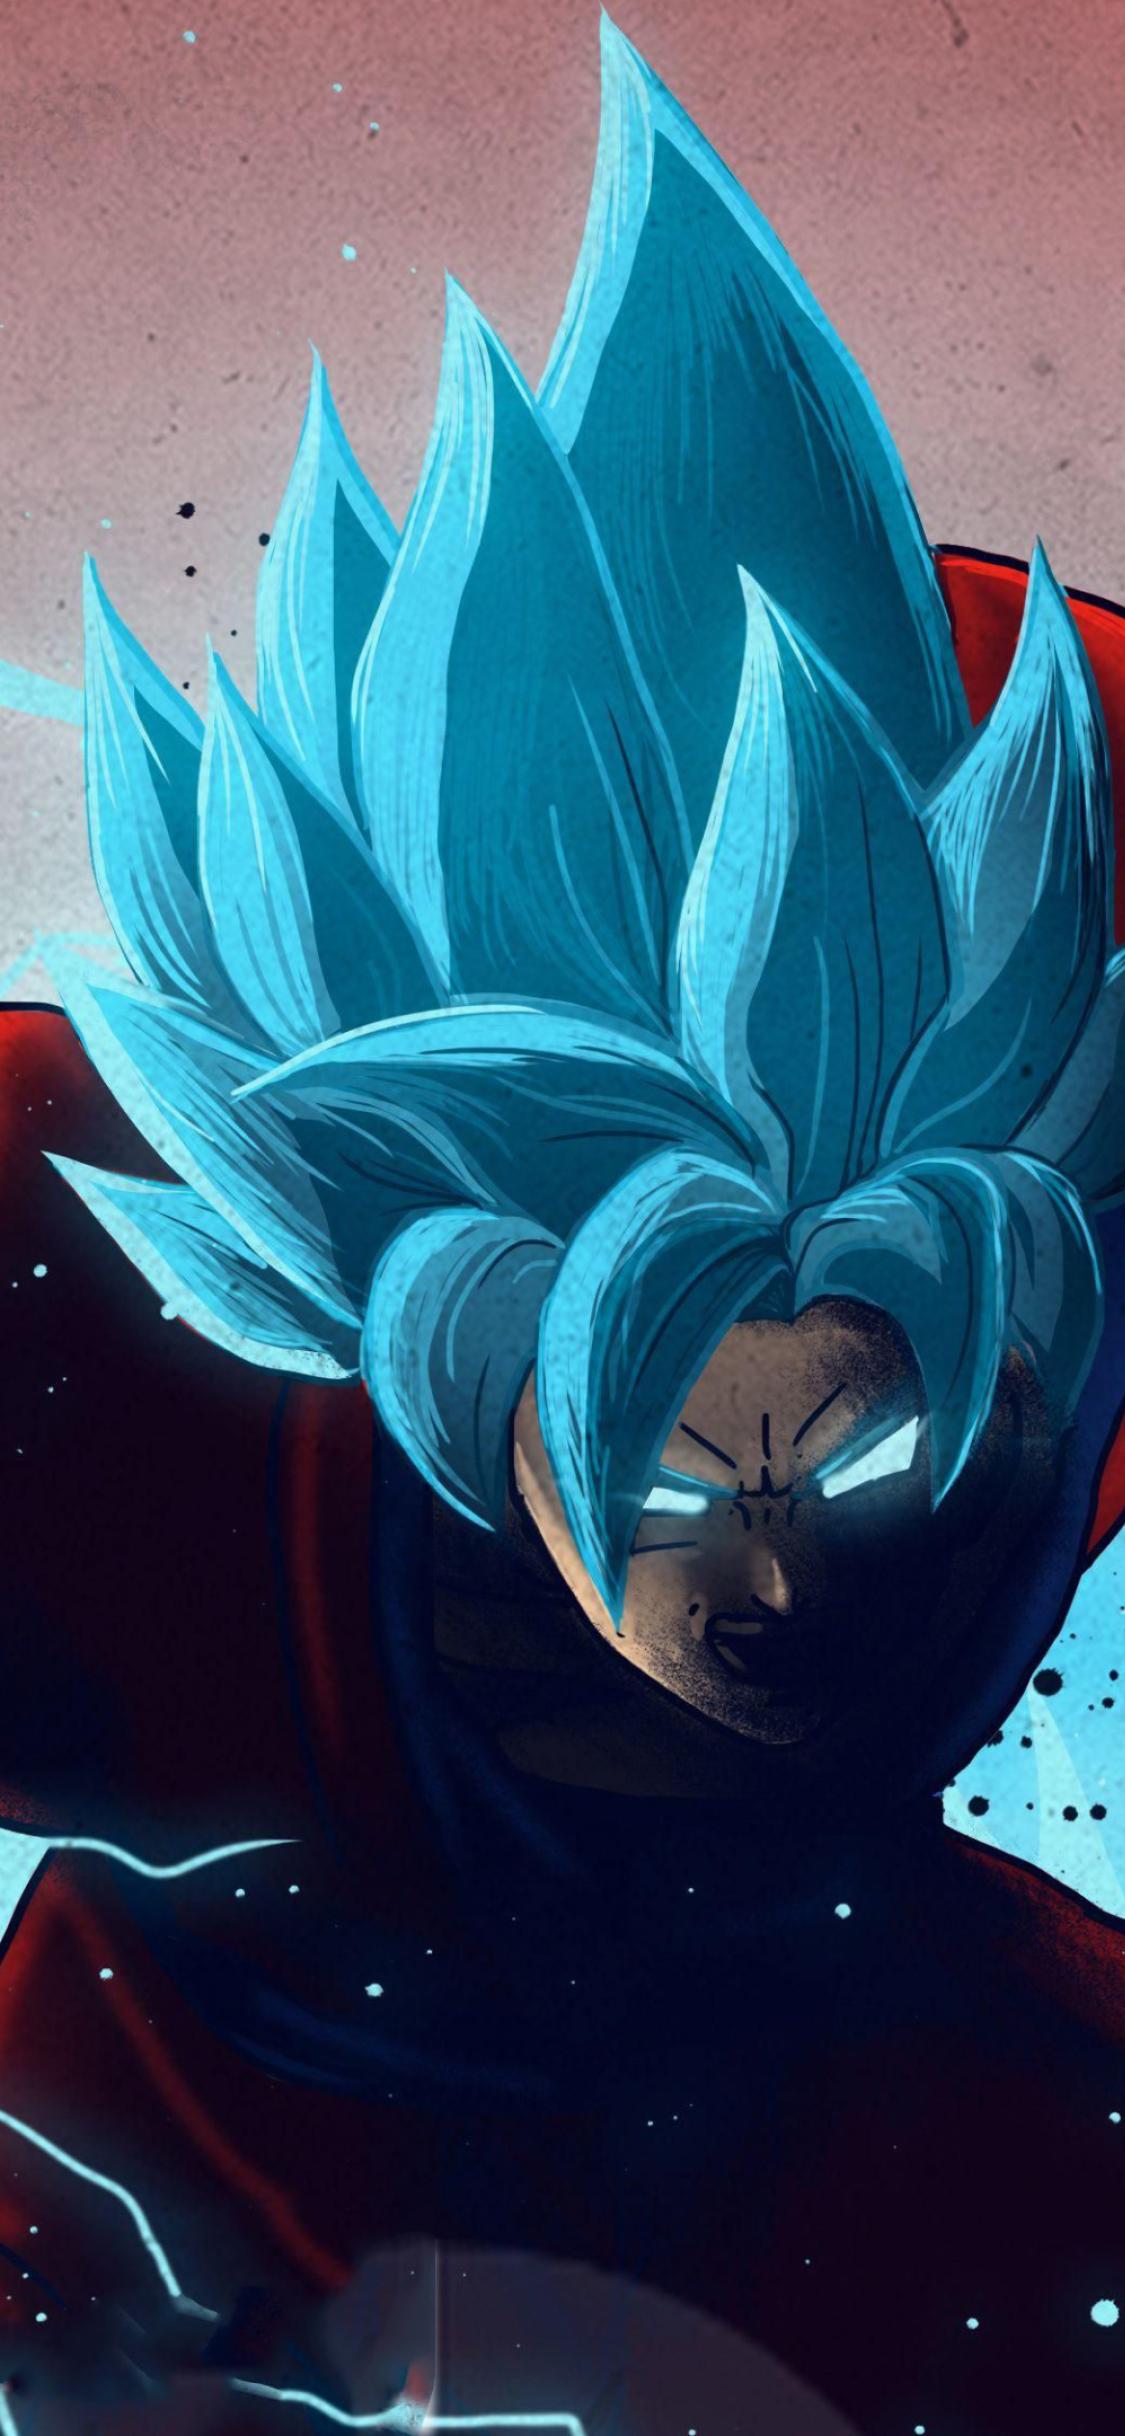 1125x2436 Goku Dragon Ball 4K Art Iphone XS,Iphone 10,Iphone X Wallpaper, HD Anime 4K Wallpapers ...